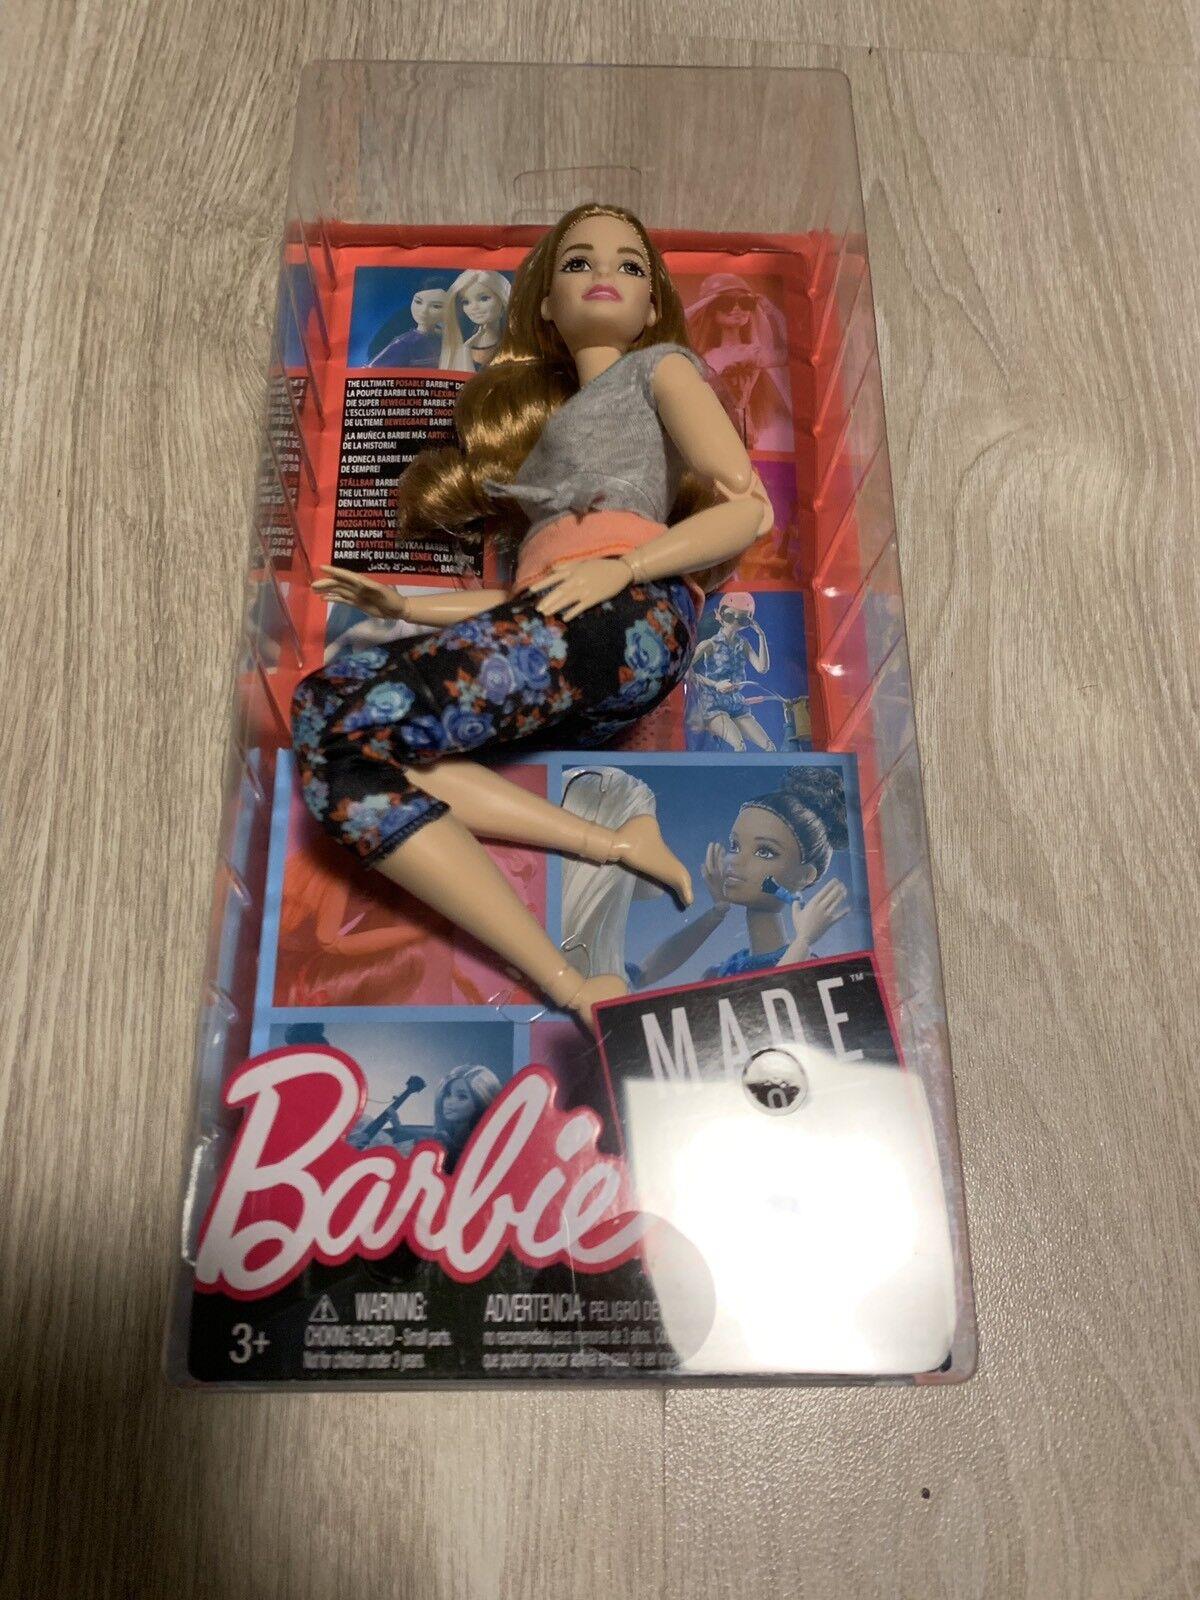 2018 Barbie Made To Move